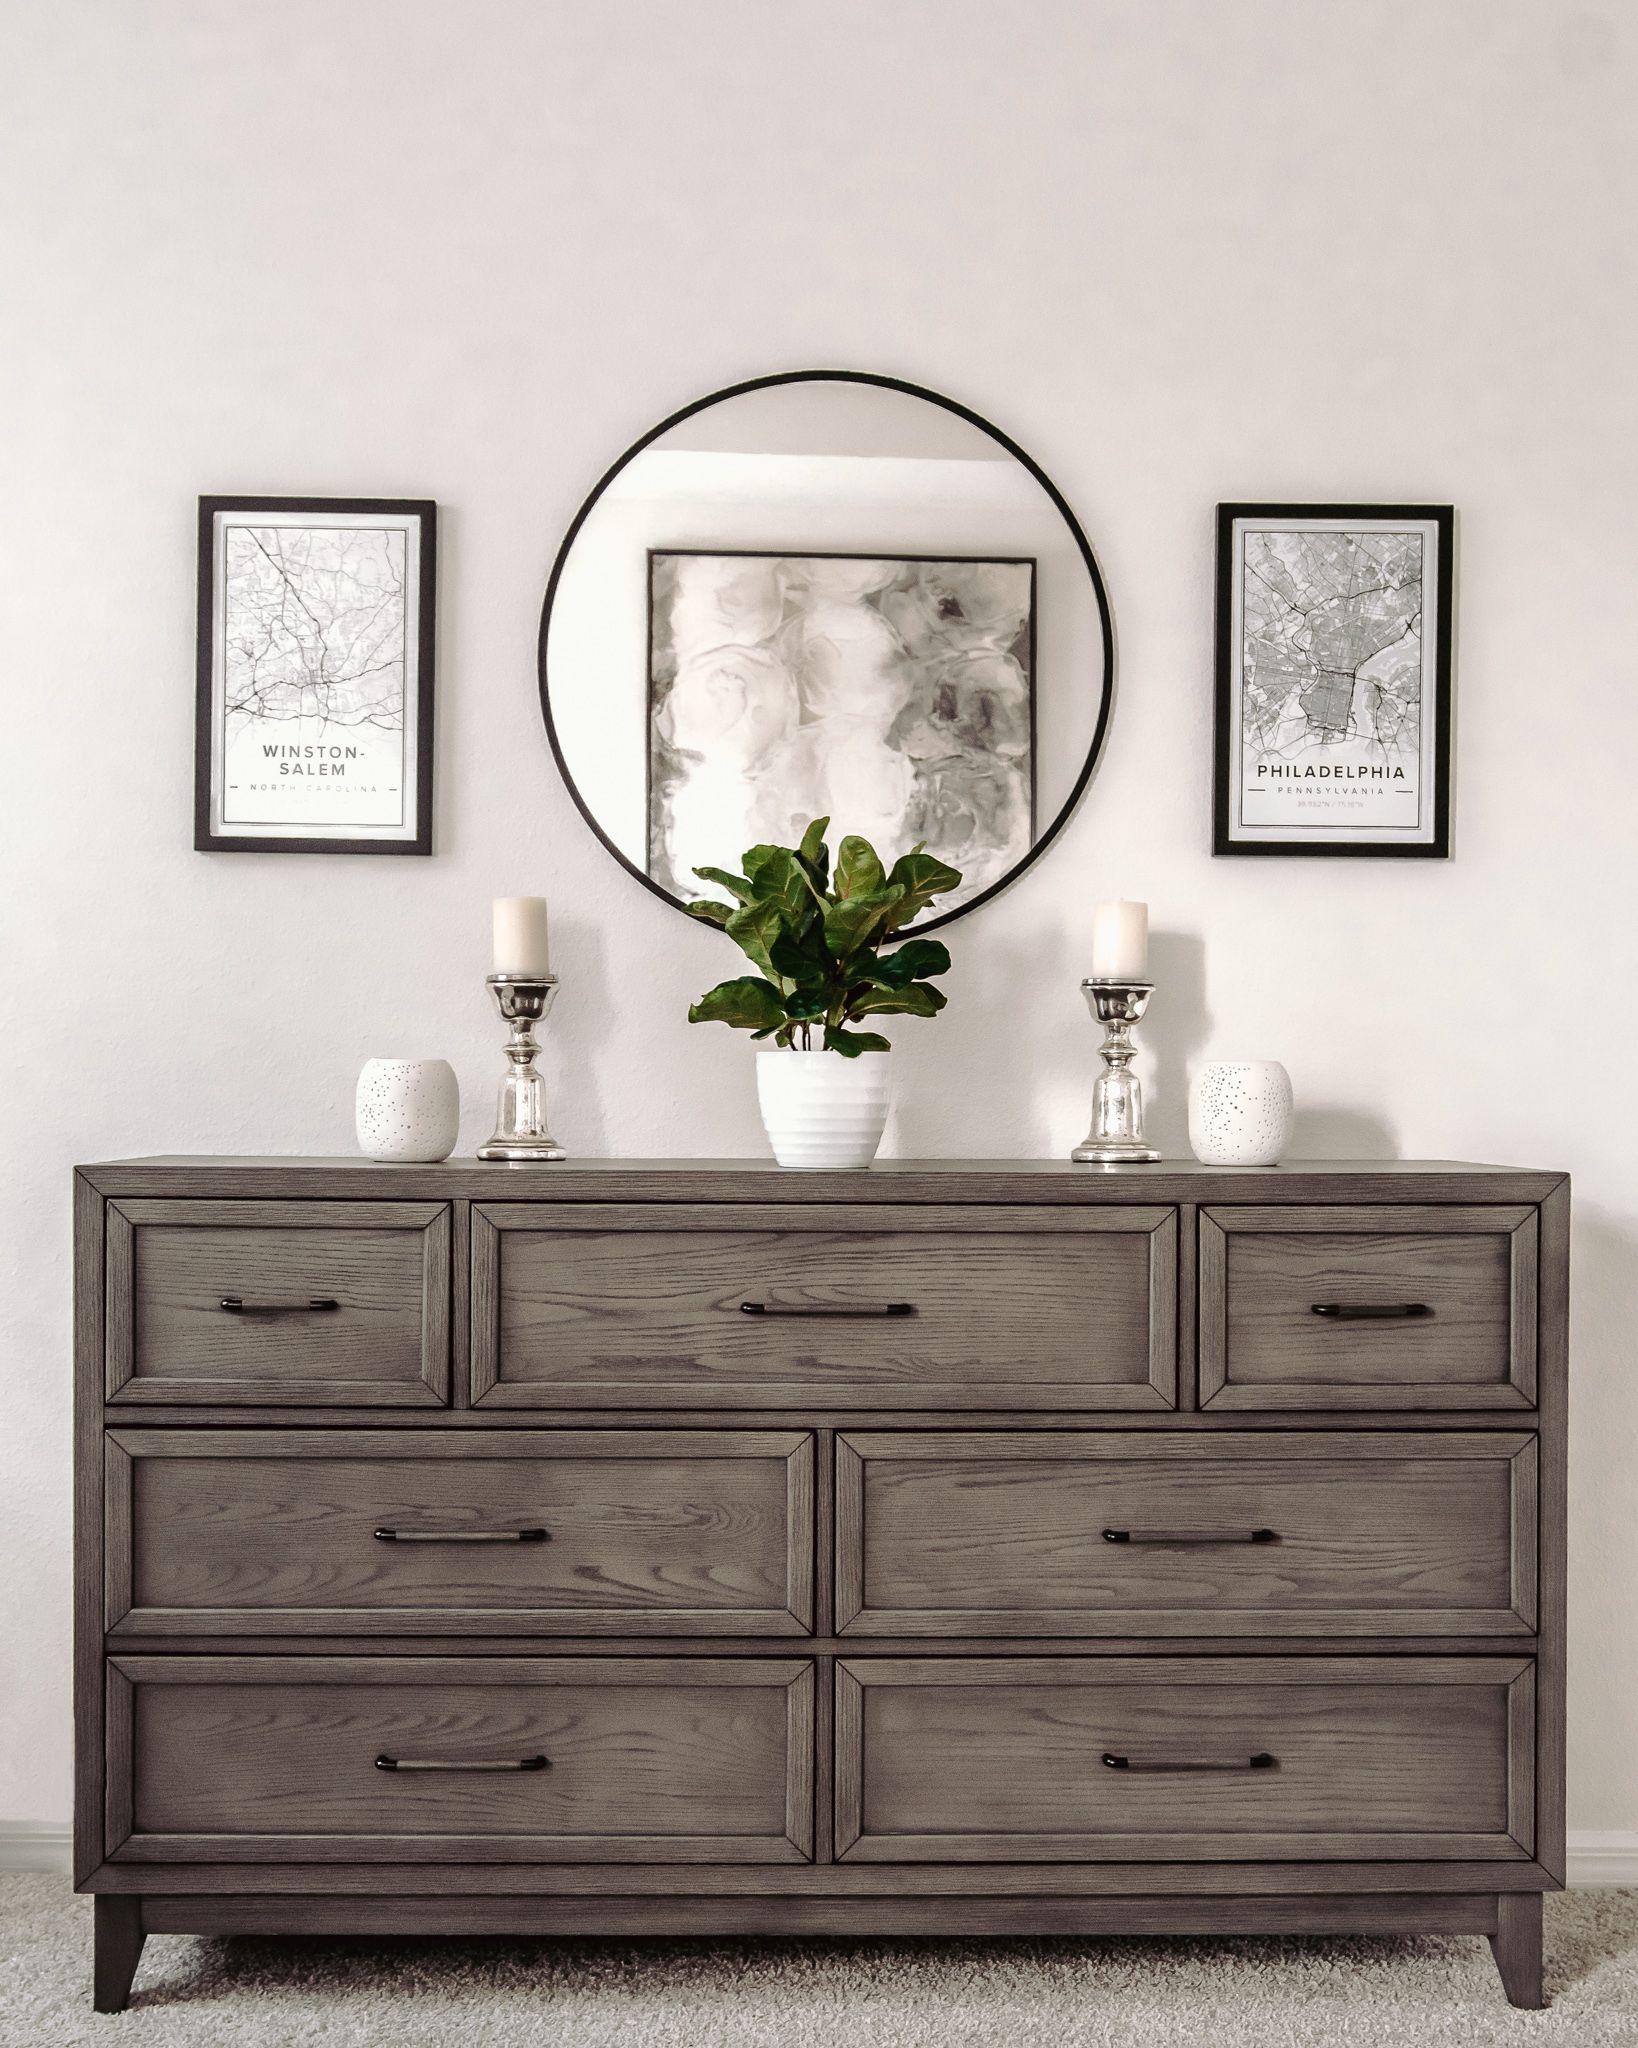 Neutral Master Bedroom Dresser Decor Dresser Decor Bedroom Dresser Decor Master Bedroom Dresser Decor [ 2048 x 1638 Pixel ]